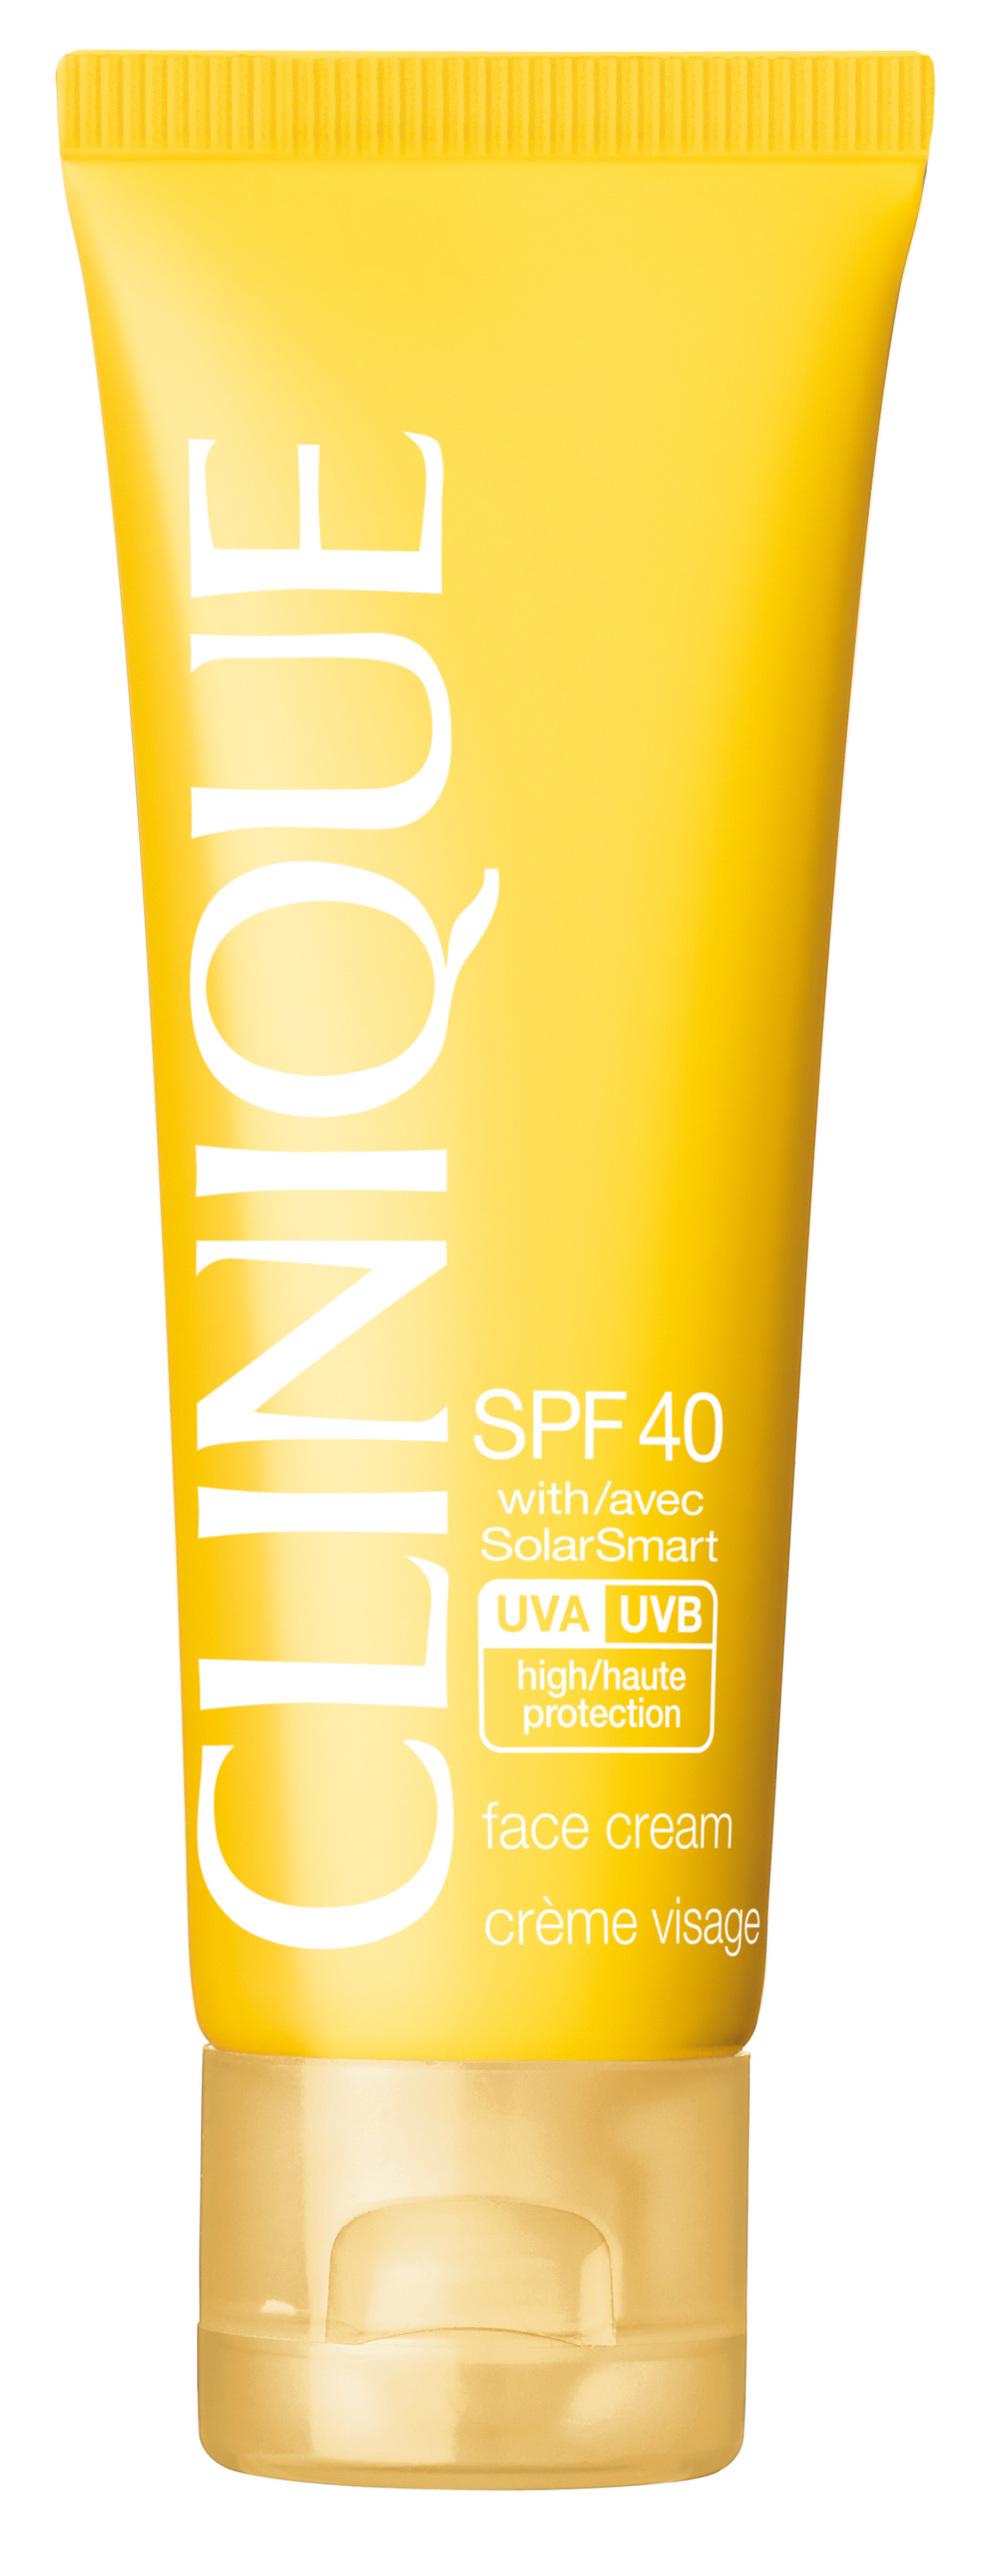 Face Cream SPF 40 Icon - INTL (Europe).jpg